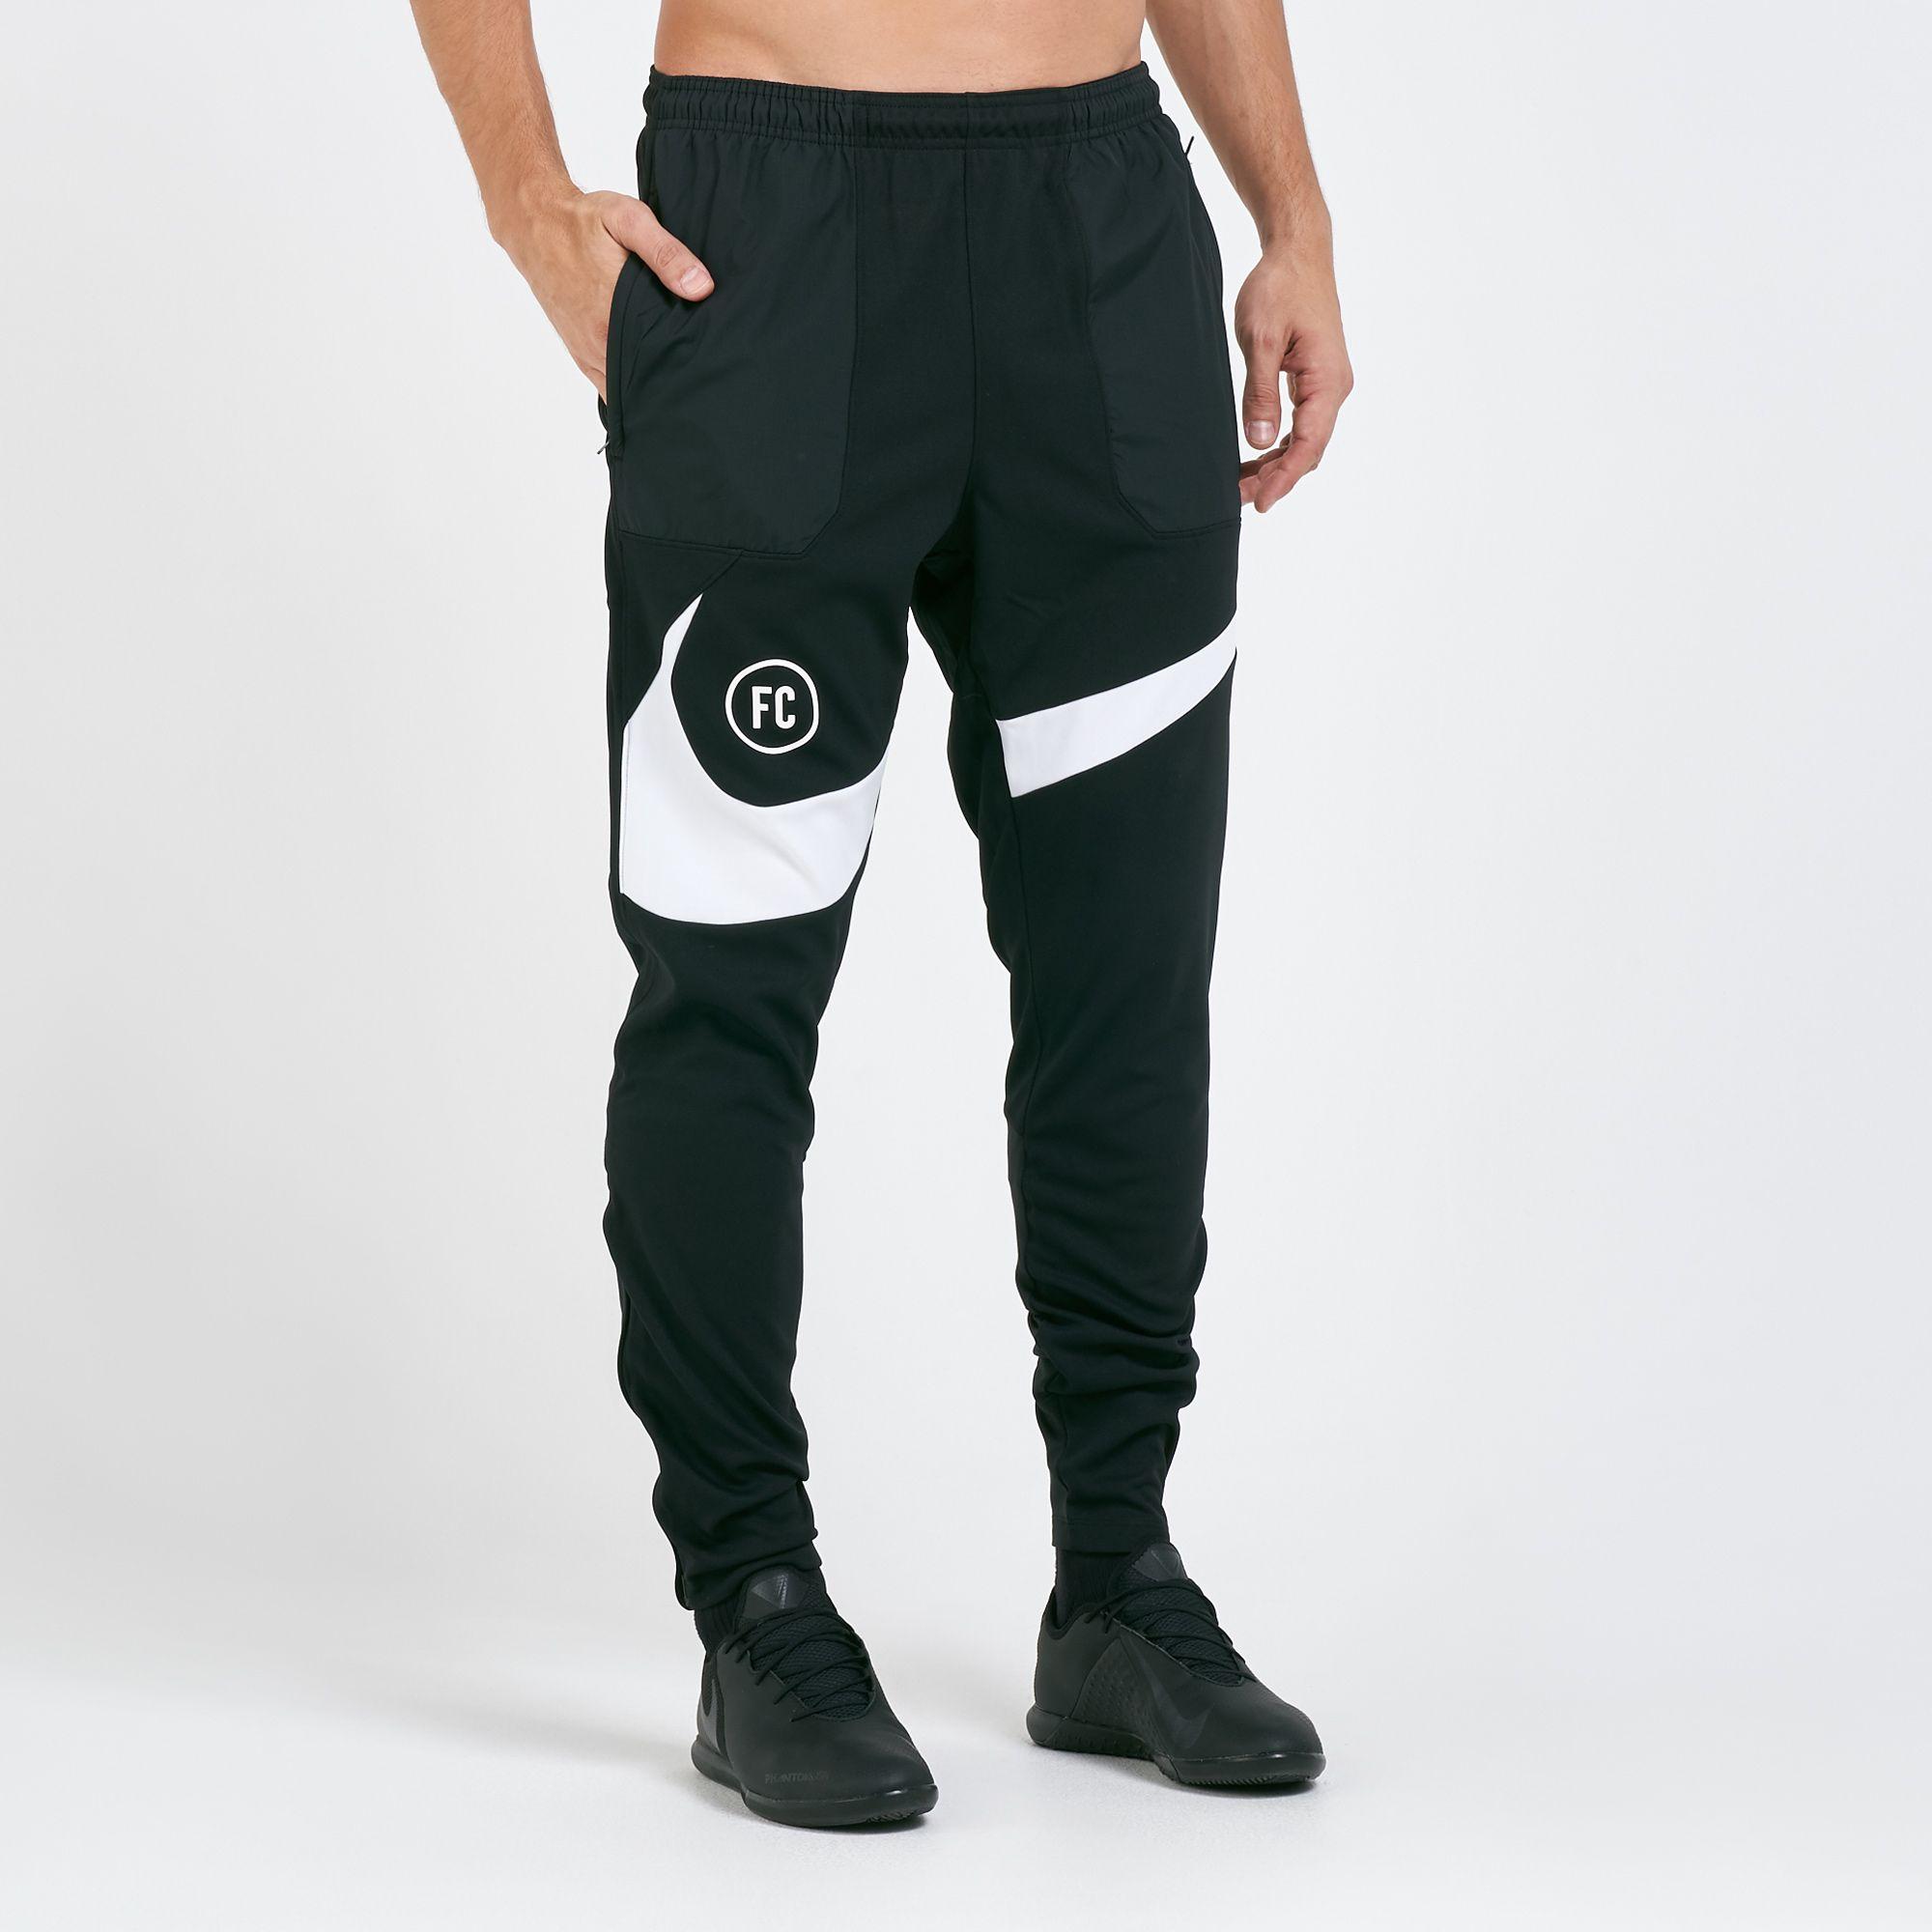 Nike Men's Nike F.C. Football Pants